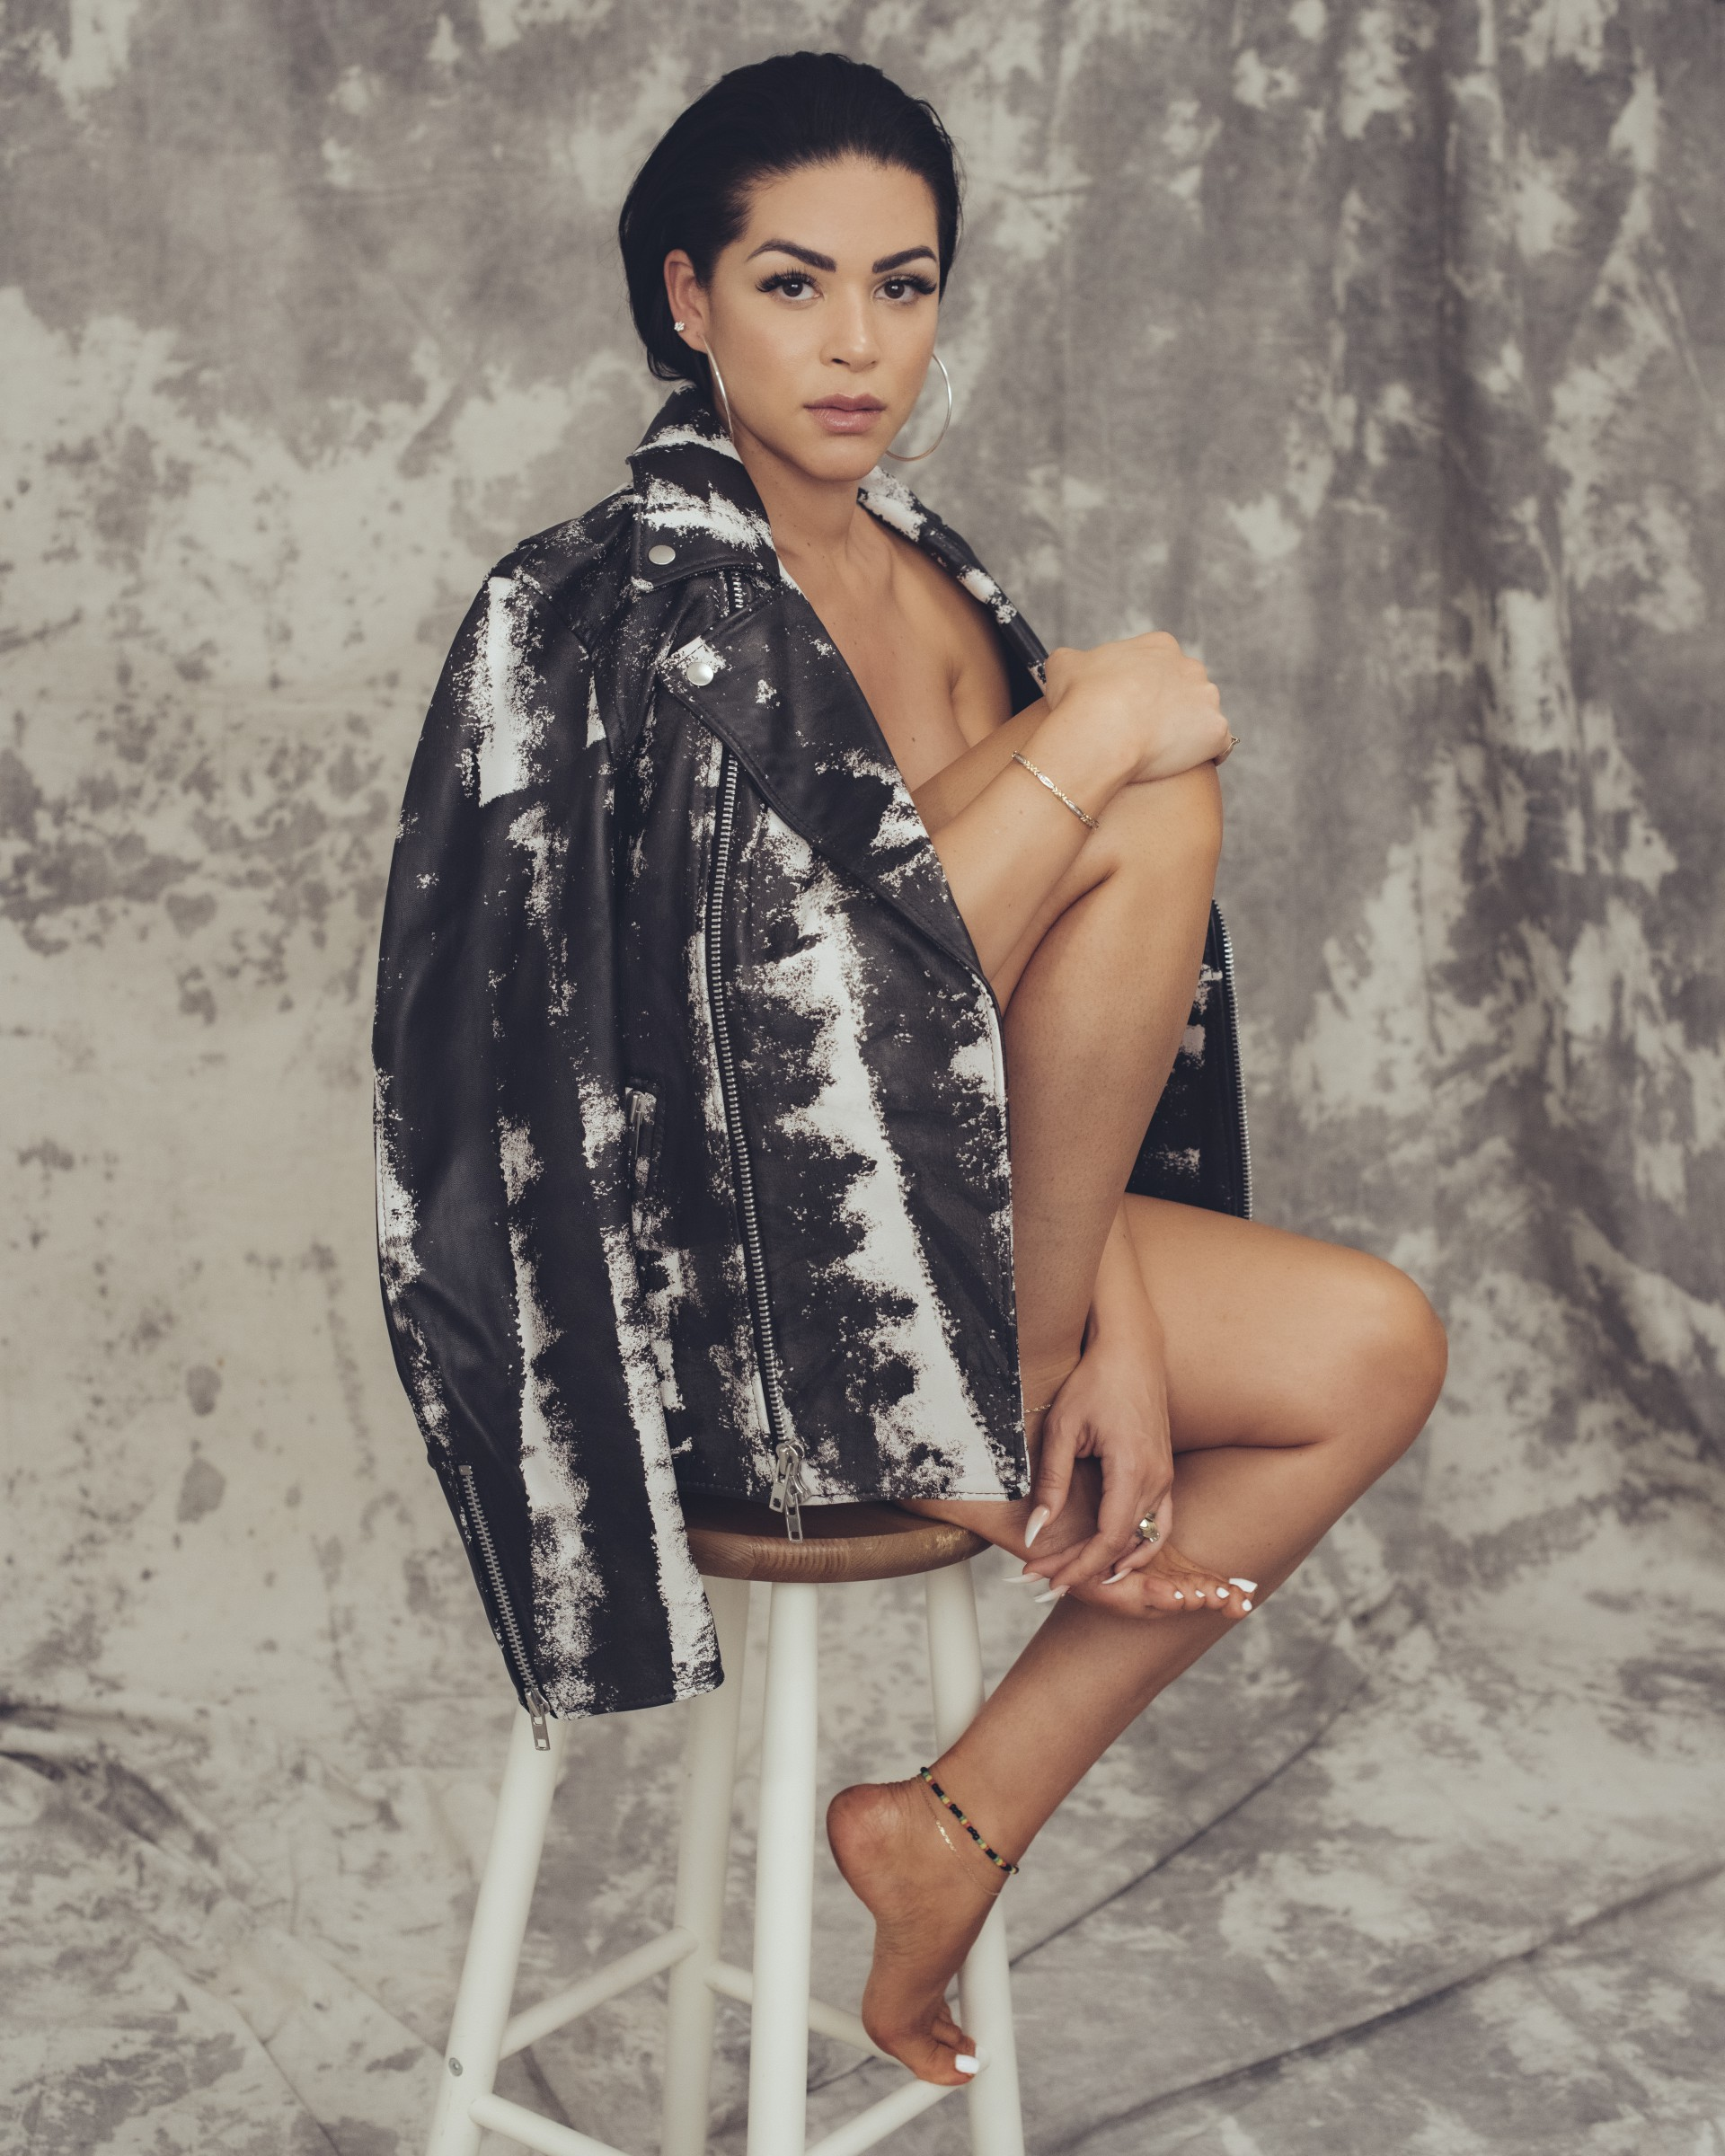 ANDREA TZELEPIDES REBECCA SILVERA – PERSONAL STYLING